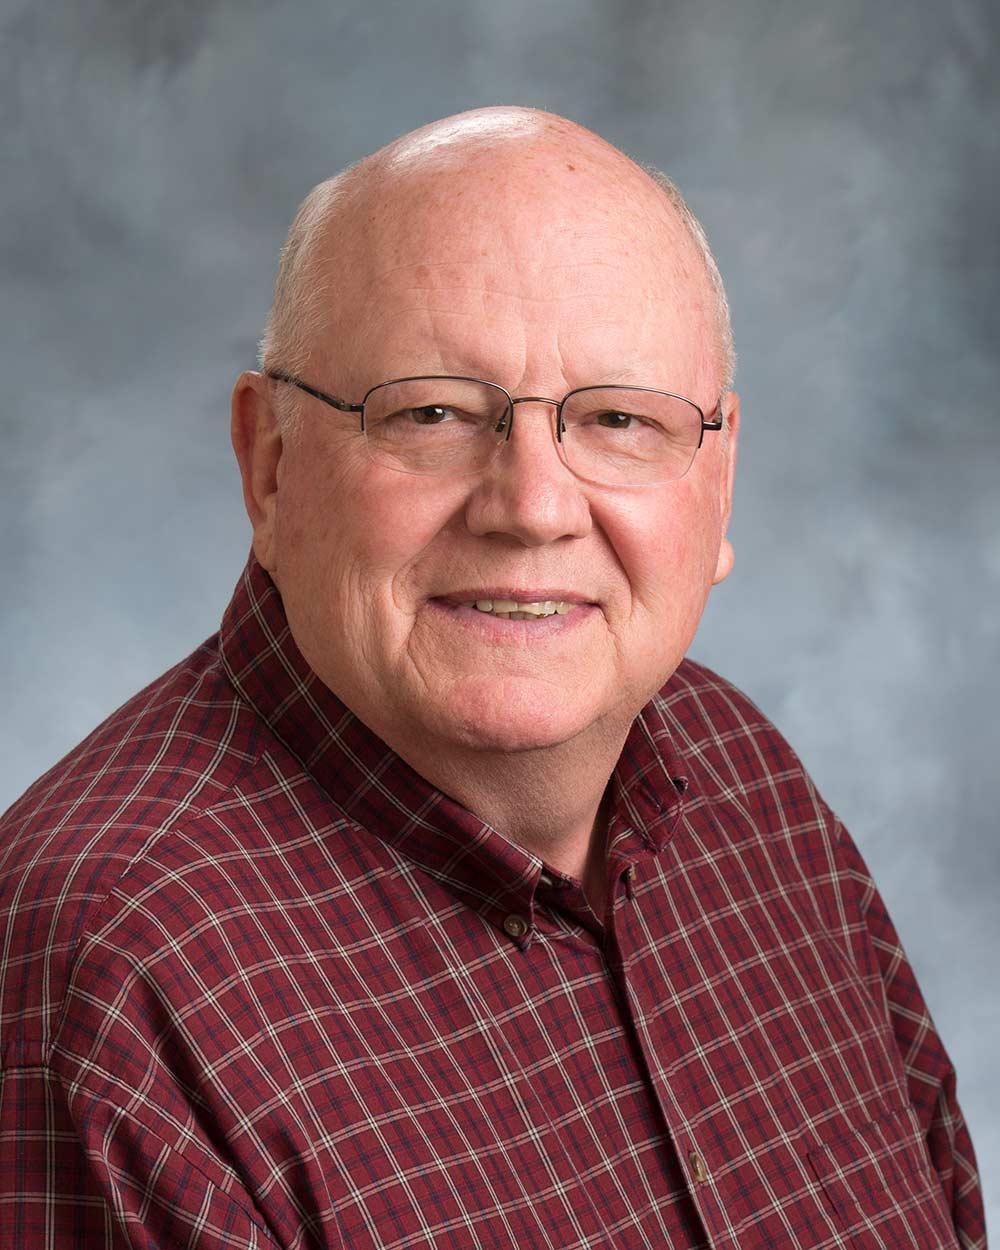 Richard White, Myron Stratton Home, Staff, Colorado Springs